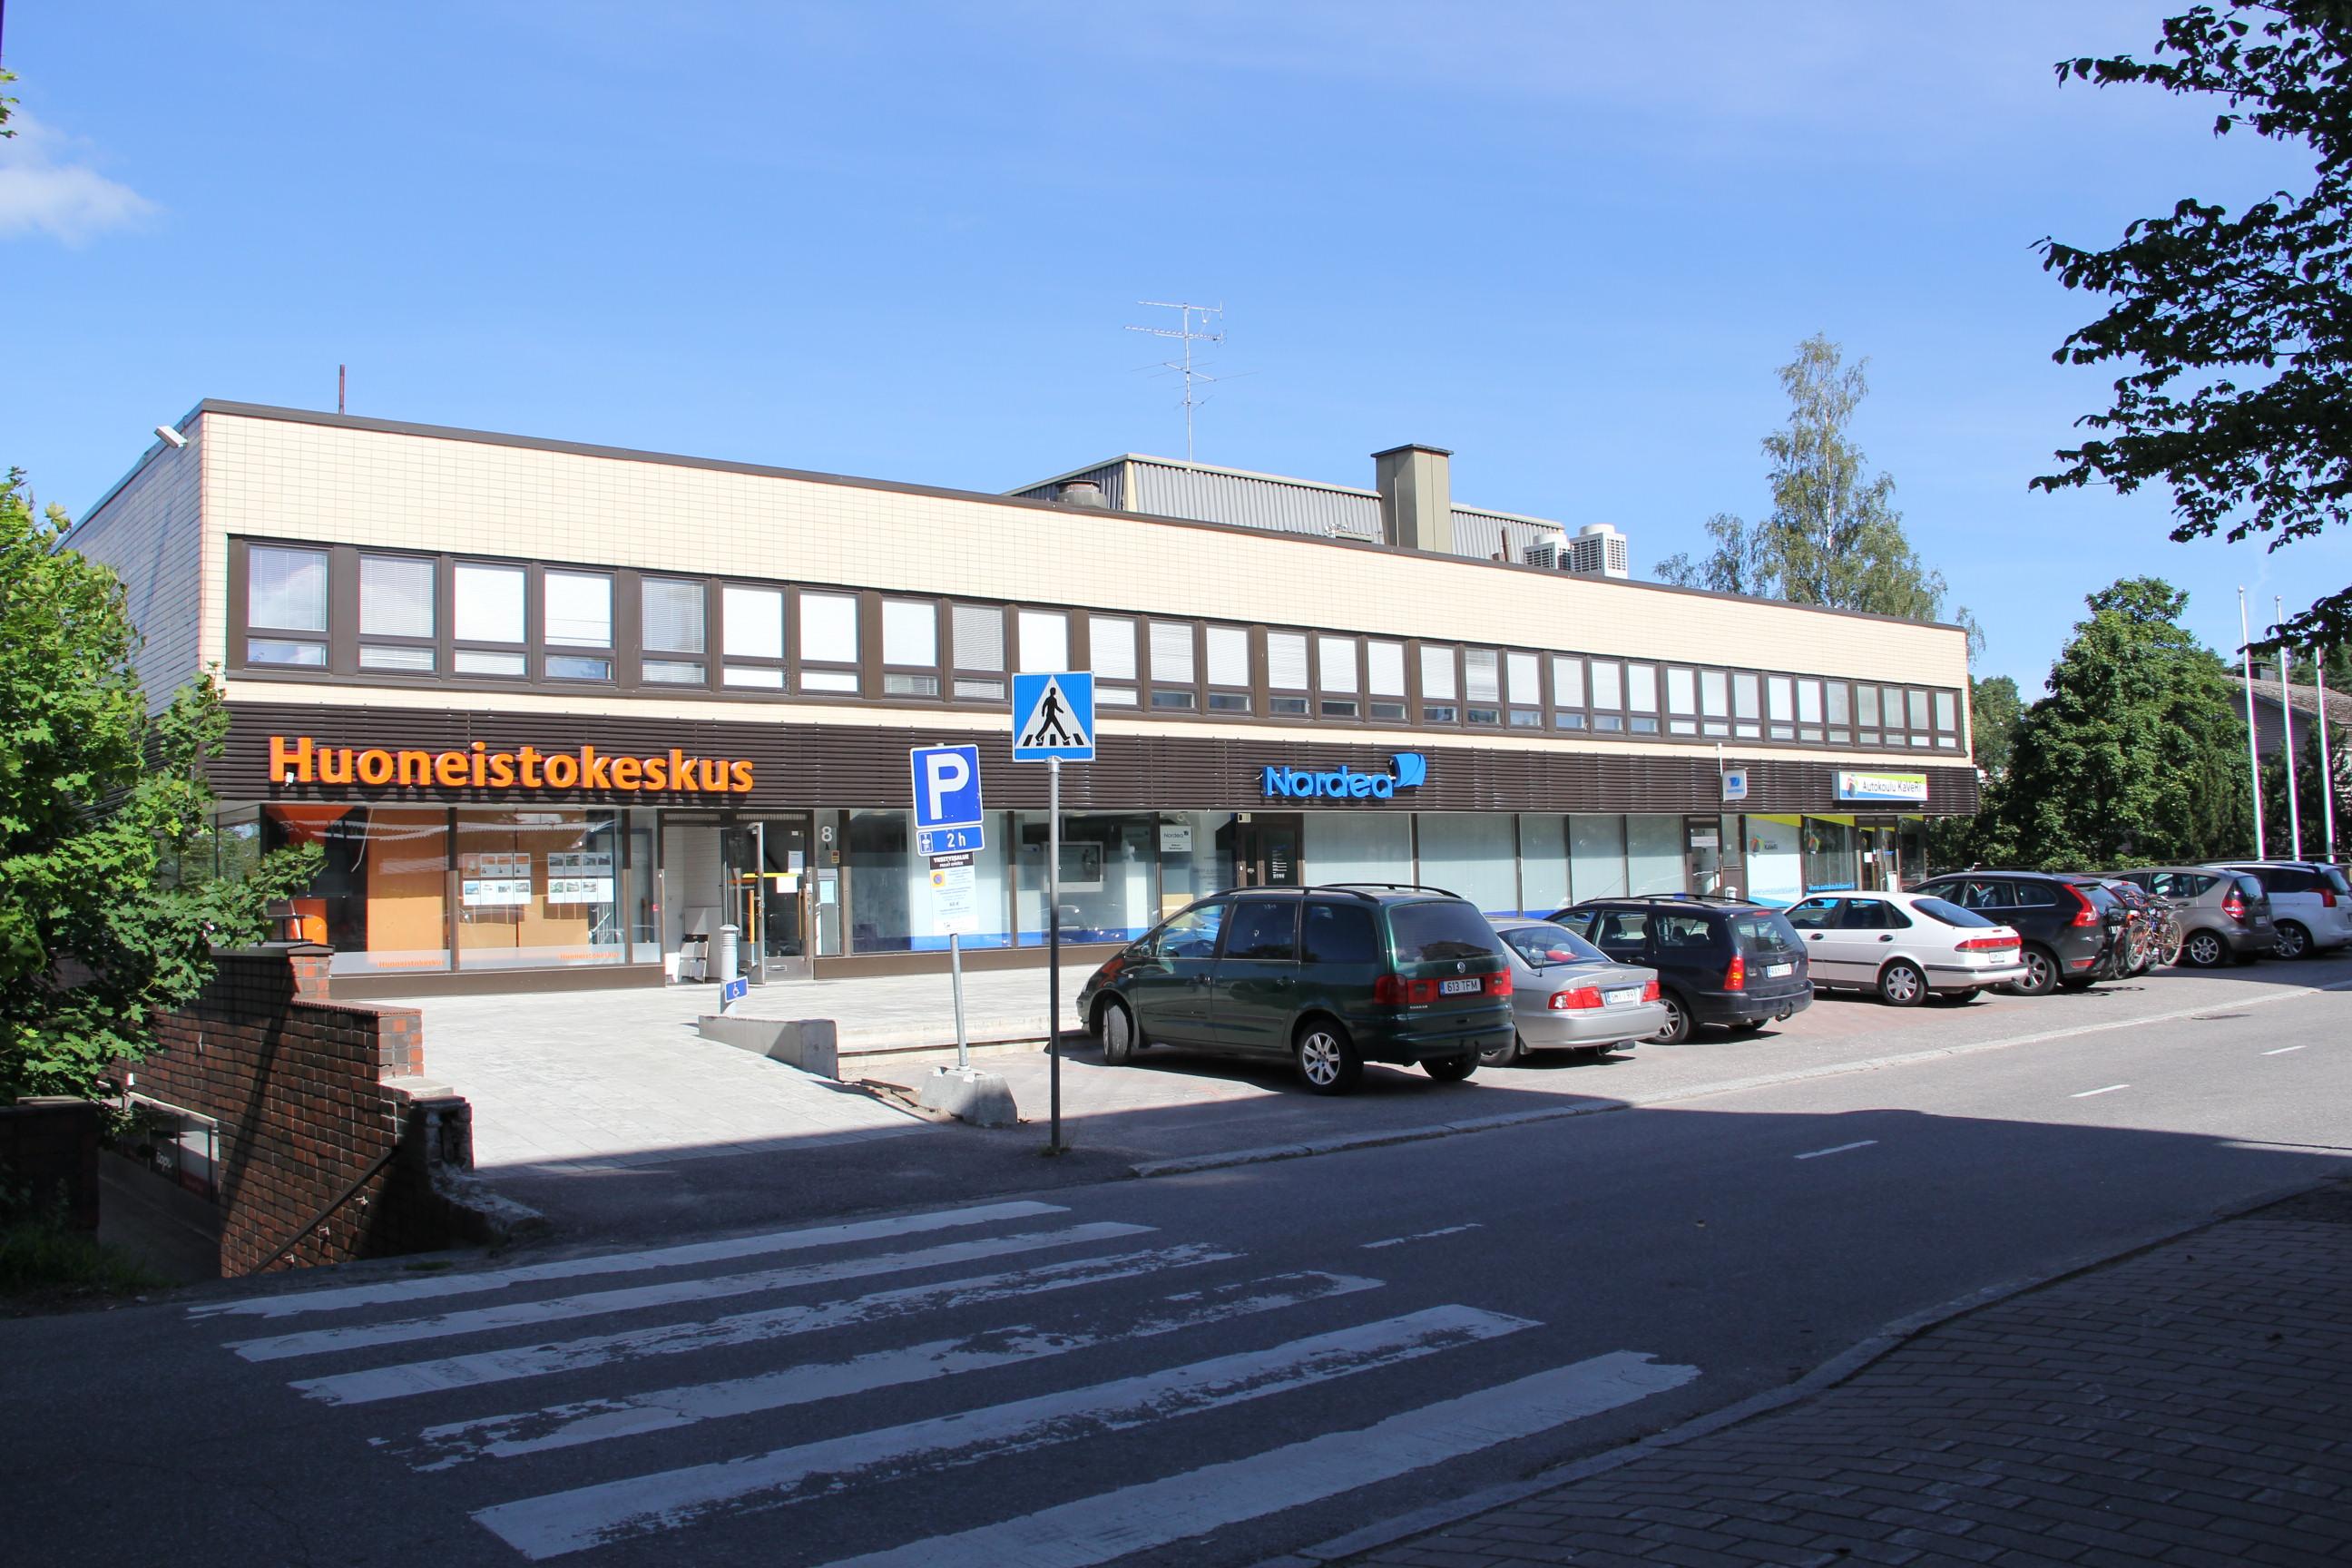 Kauppatie 8, Hyrylä, Tuusula